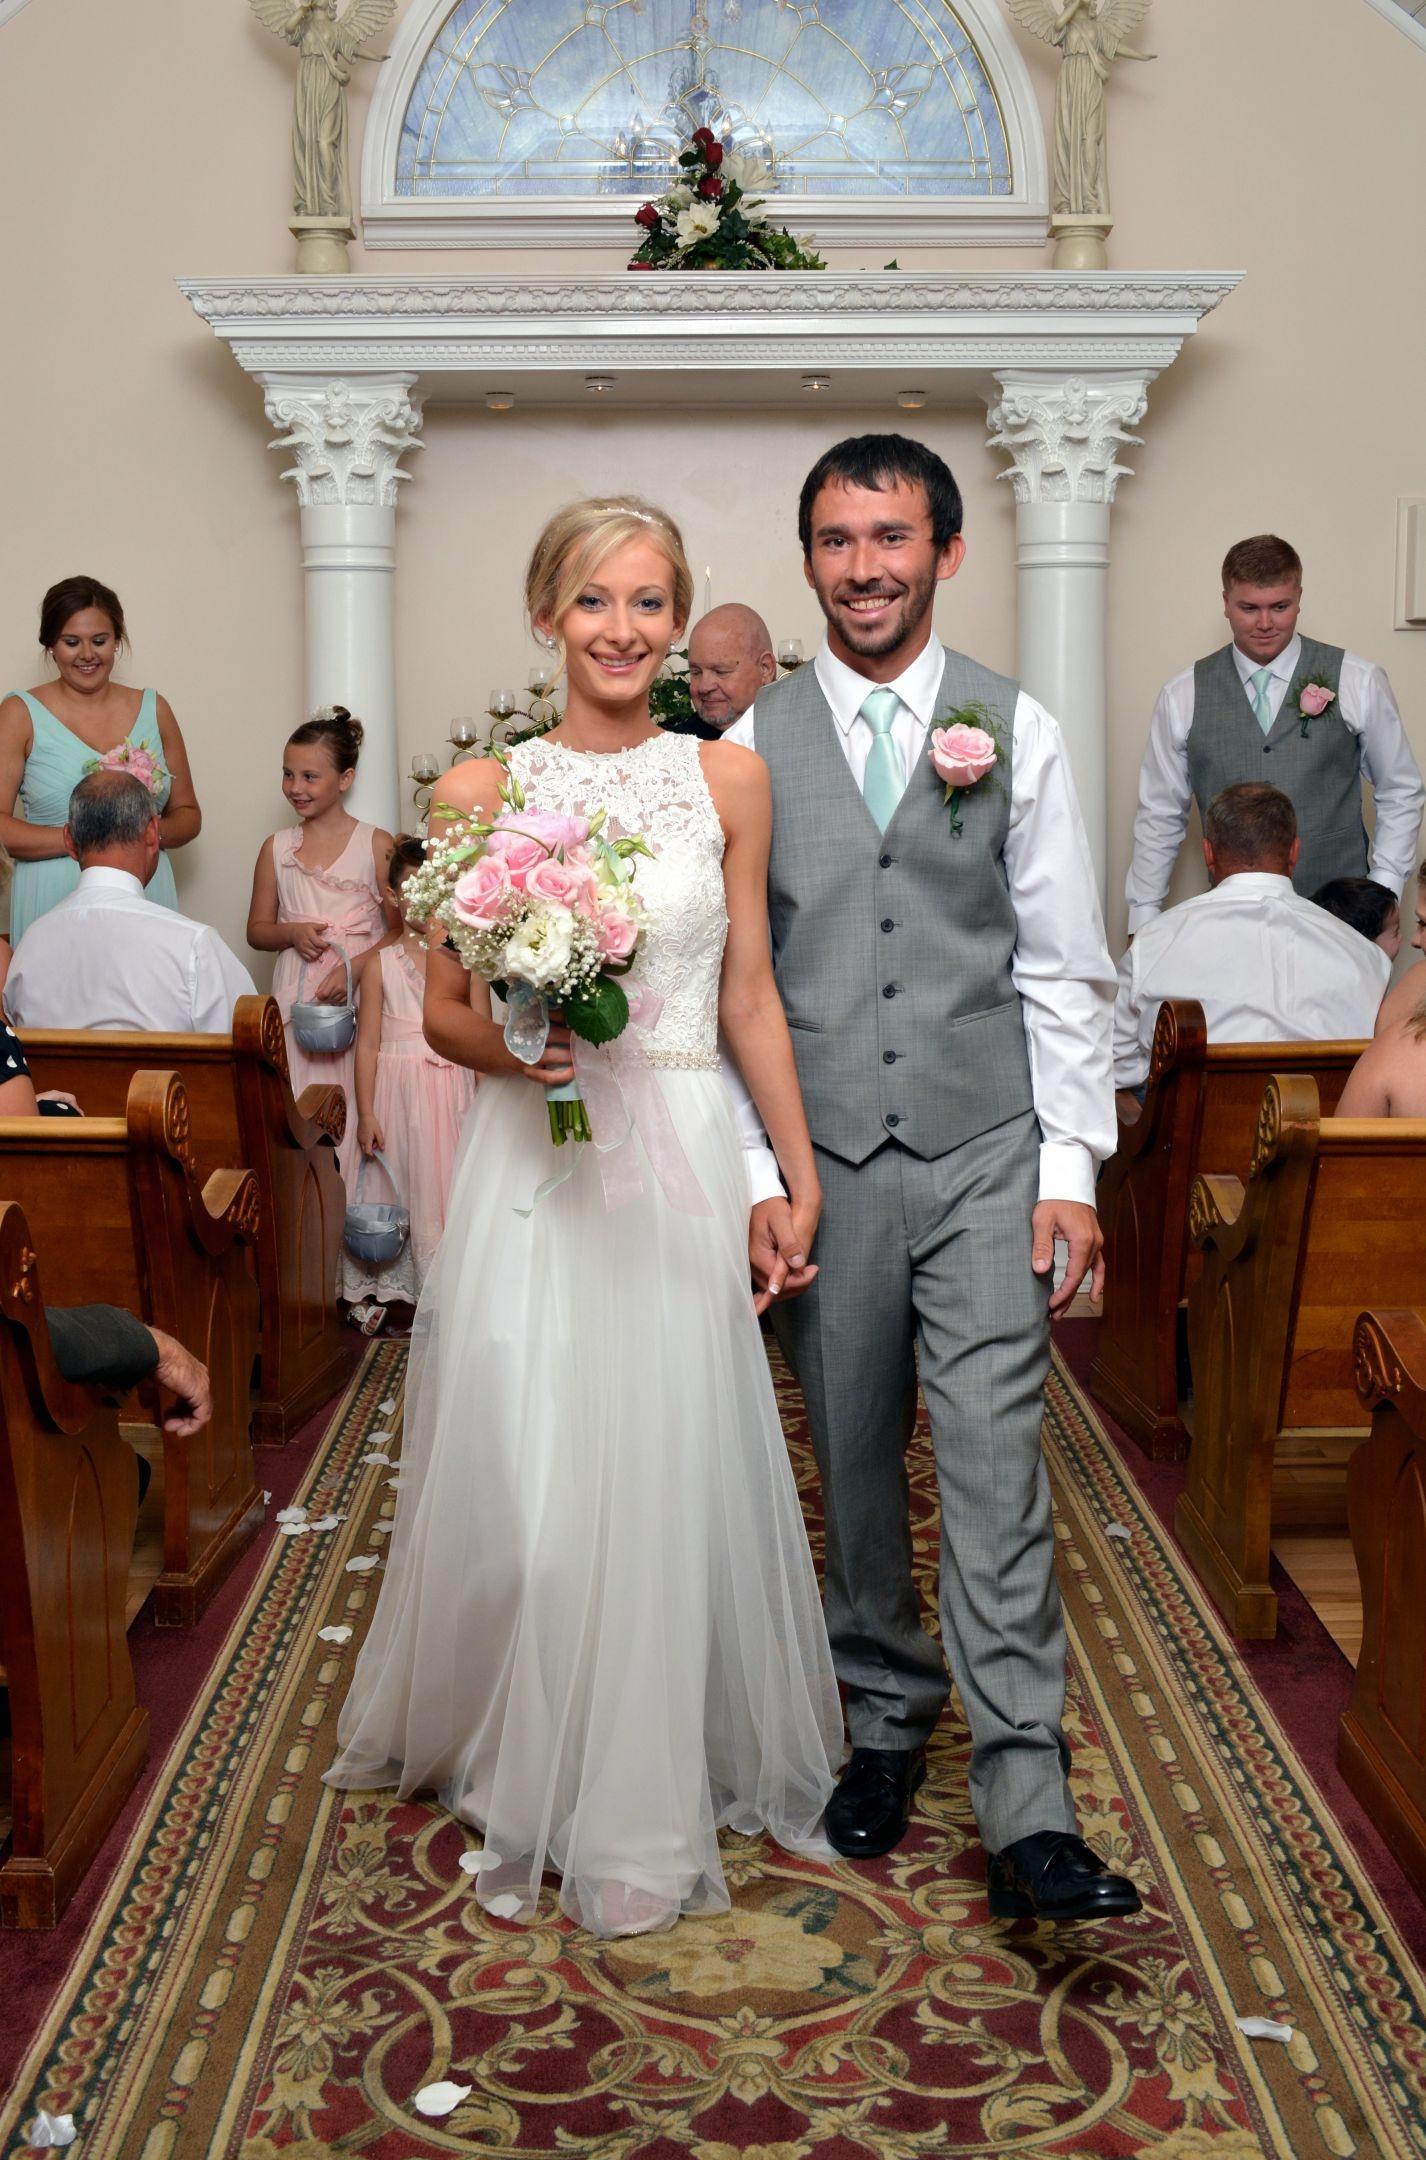 Wedding Chapel at Honeymoon Hills, Gatlinburg Wedding Chapel image 6